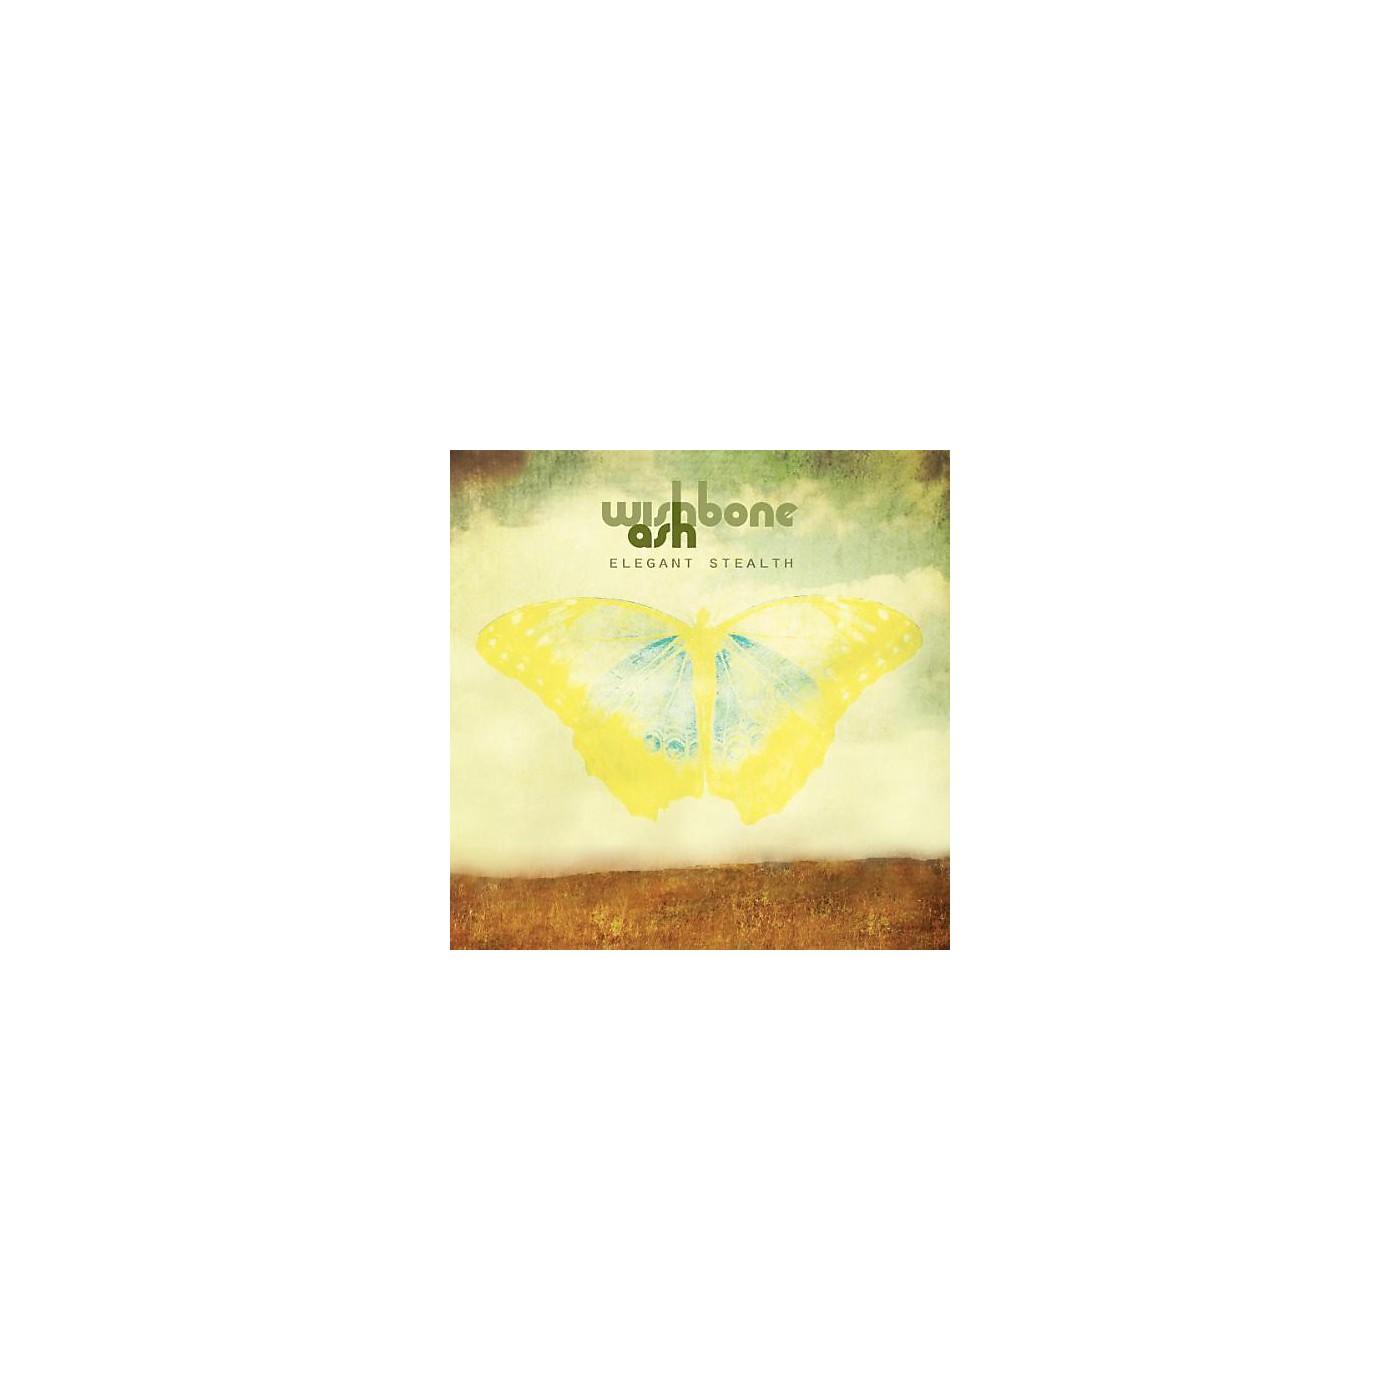 Alliance Wishbone Ash - Elegant Stealth thumbnail